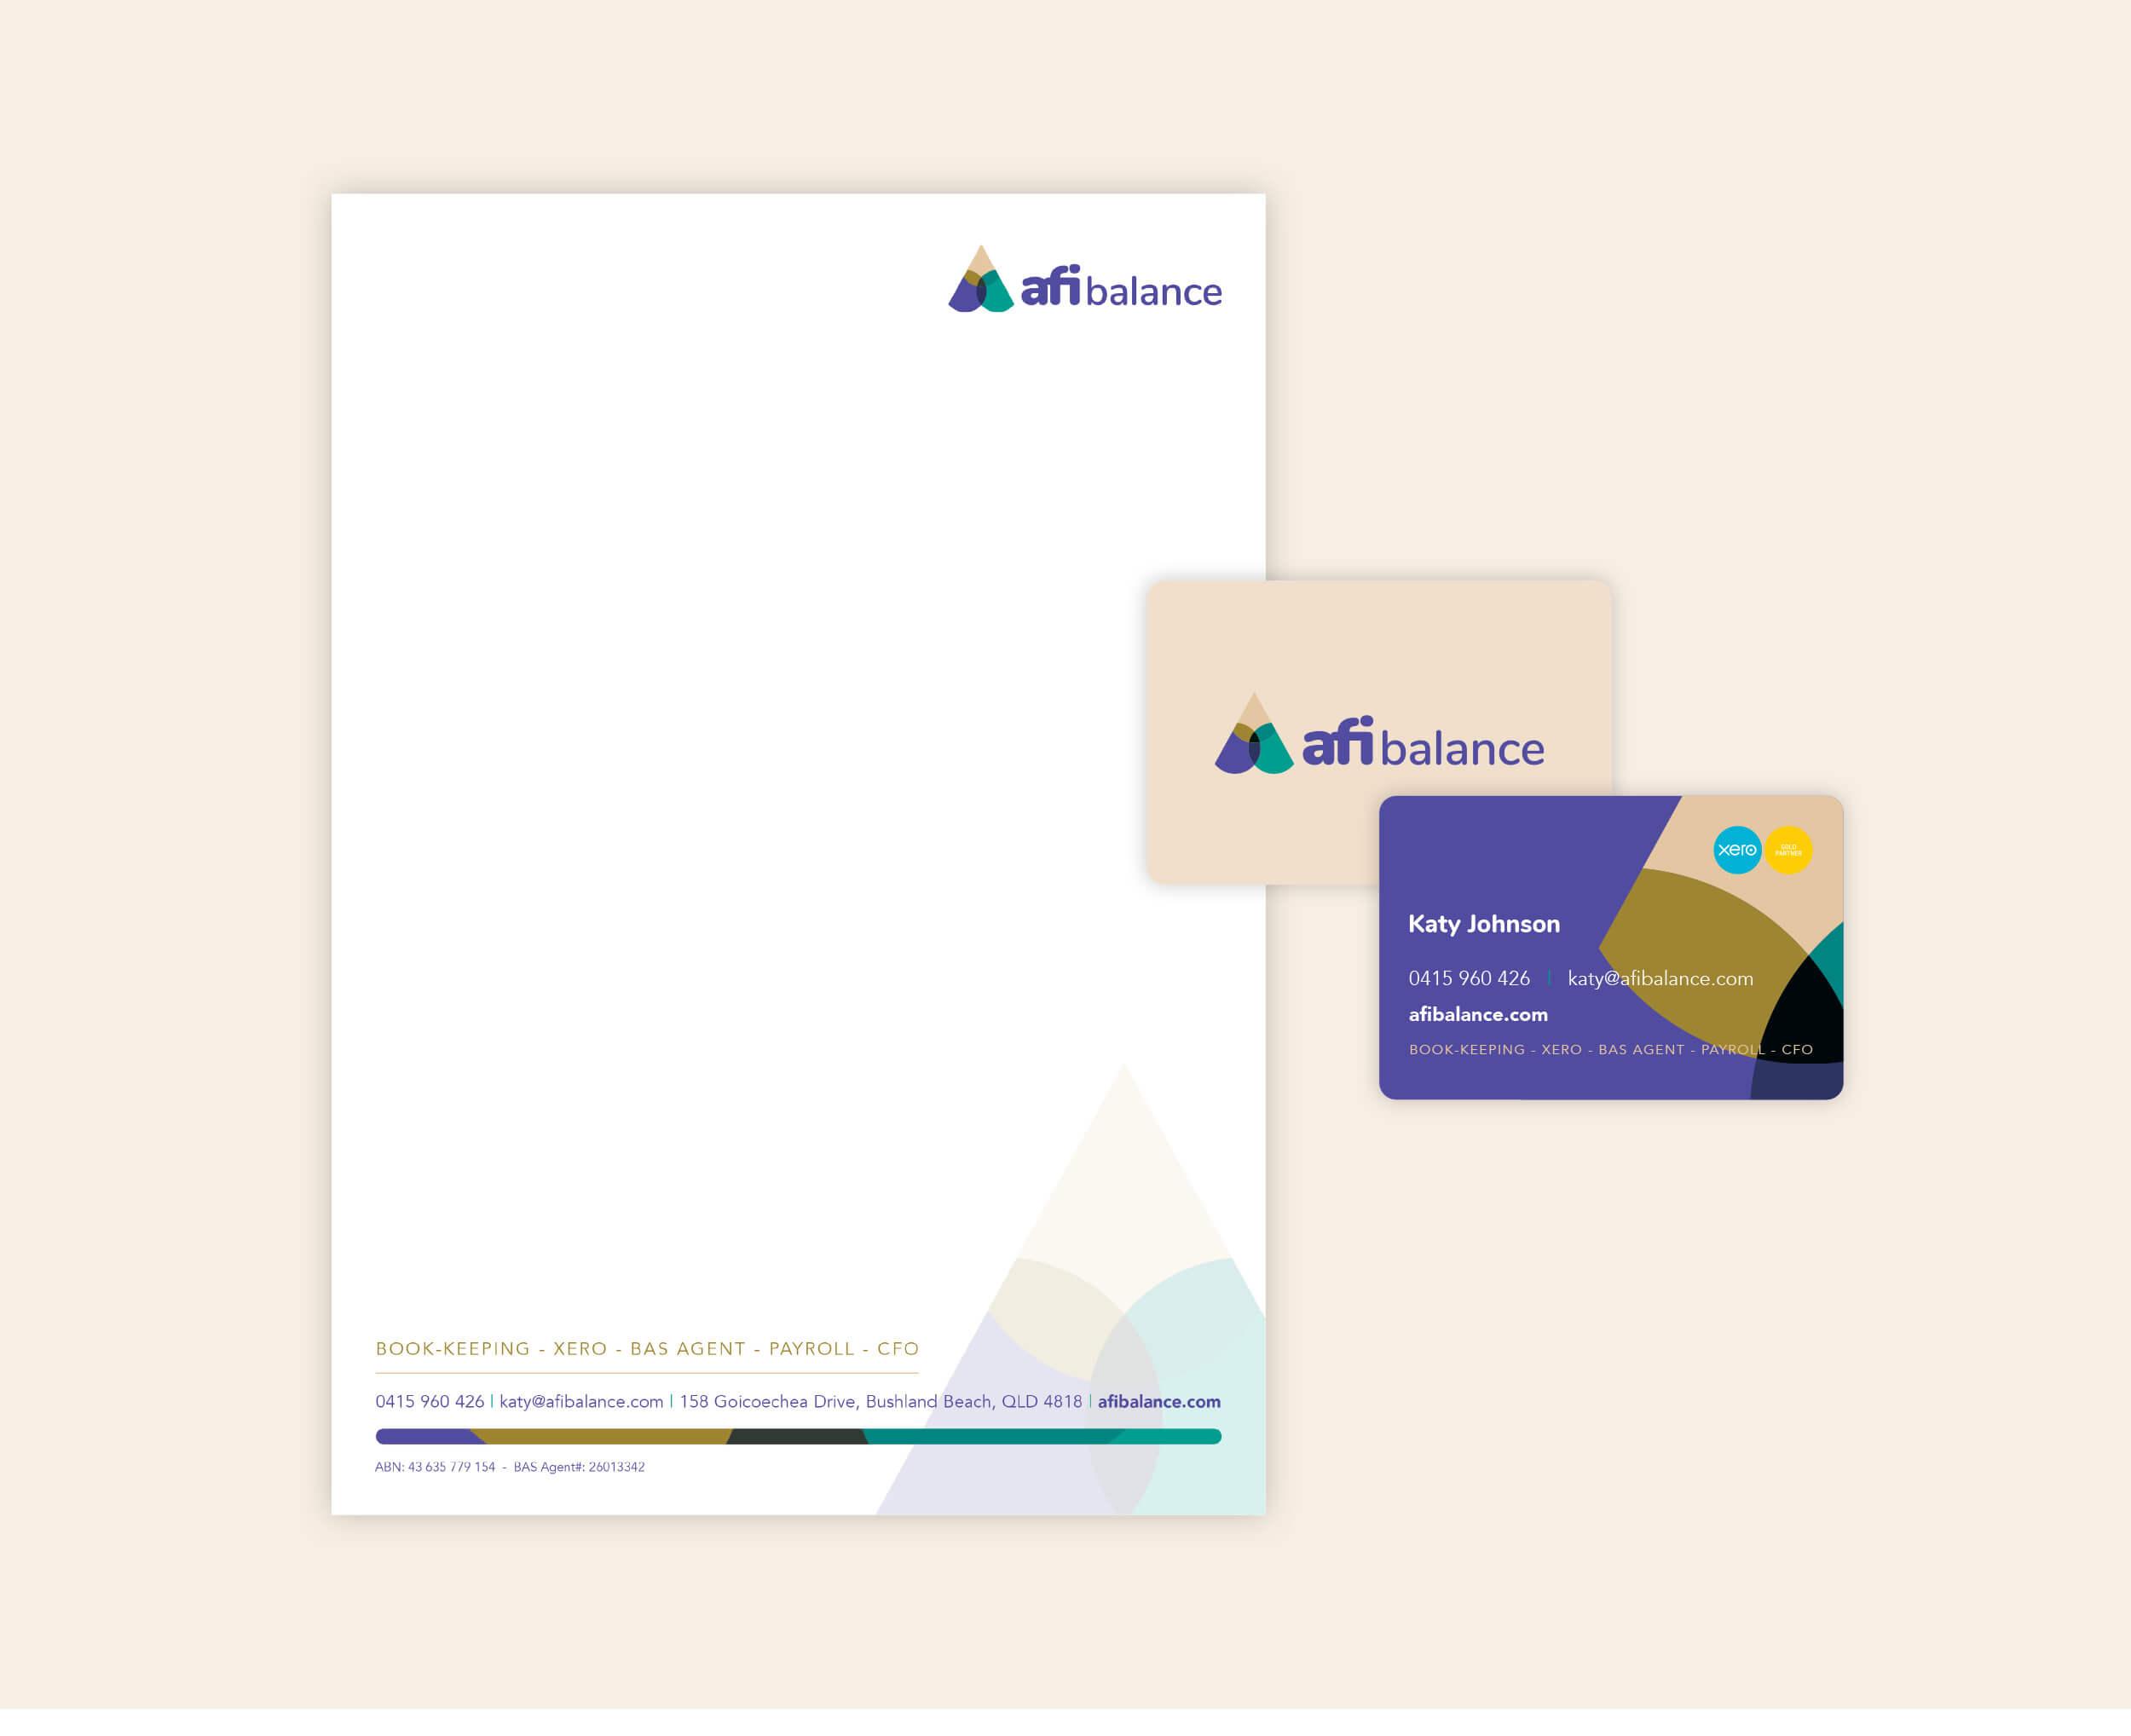 Verve Design example afi balance Stationery